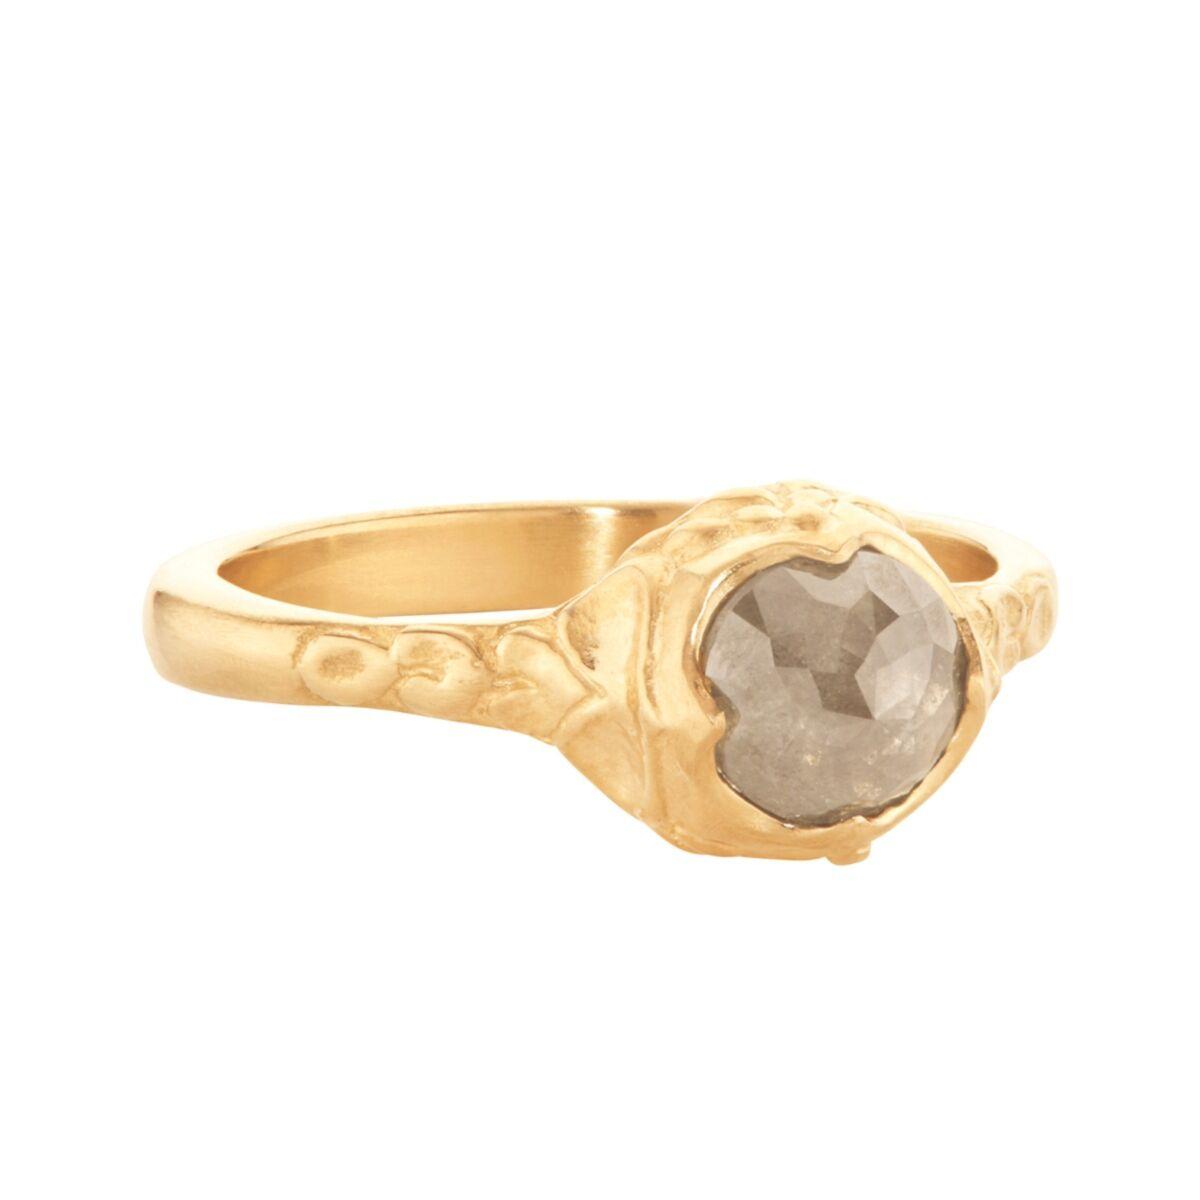 Mend Ring image